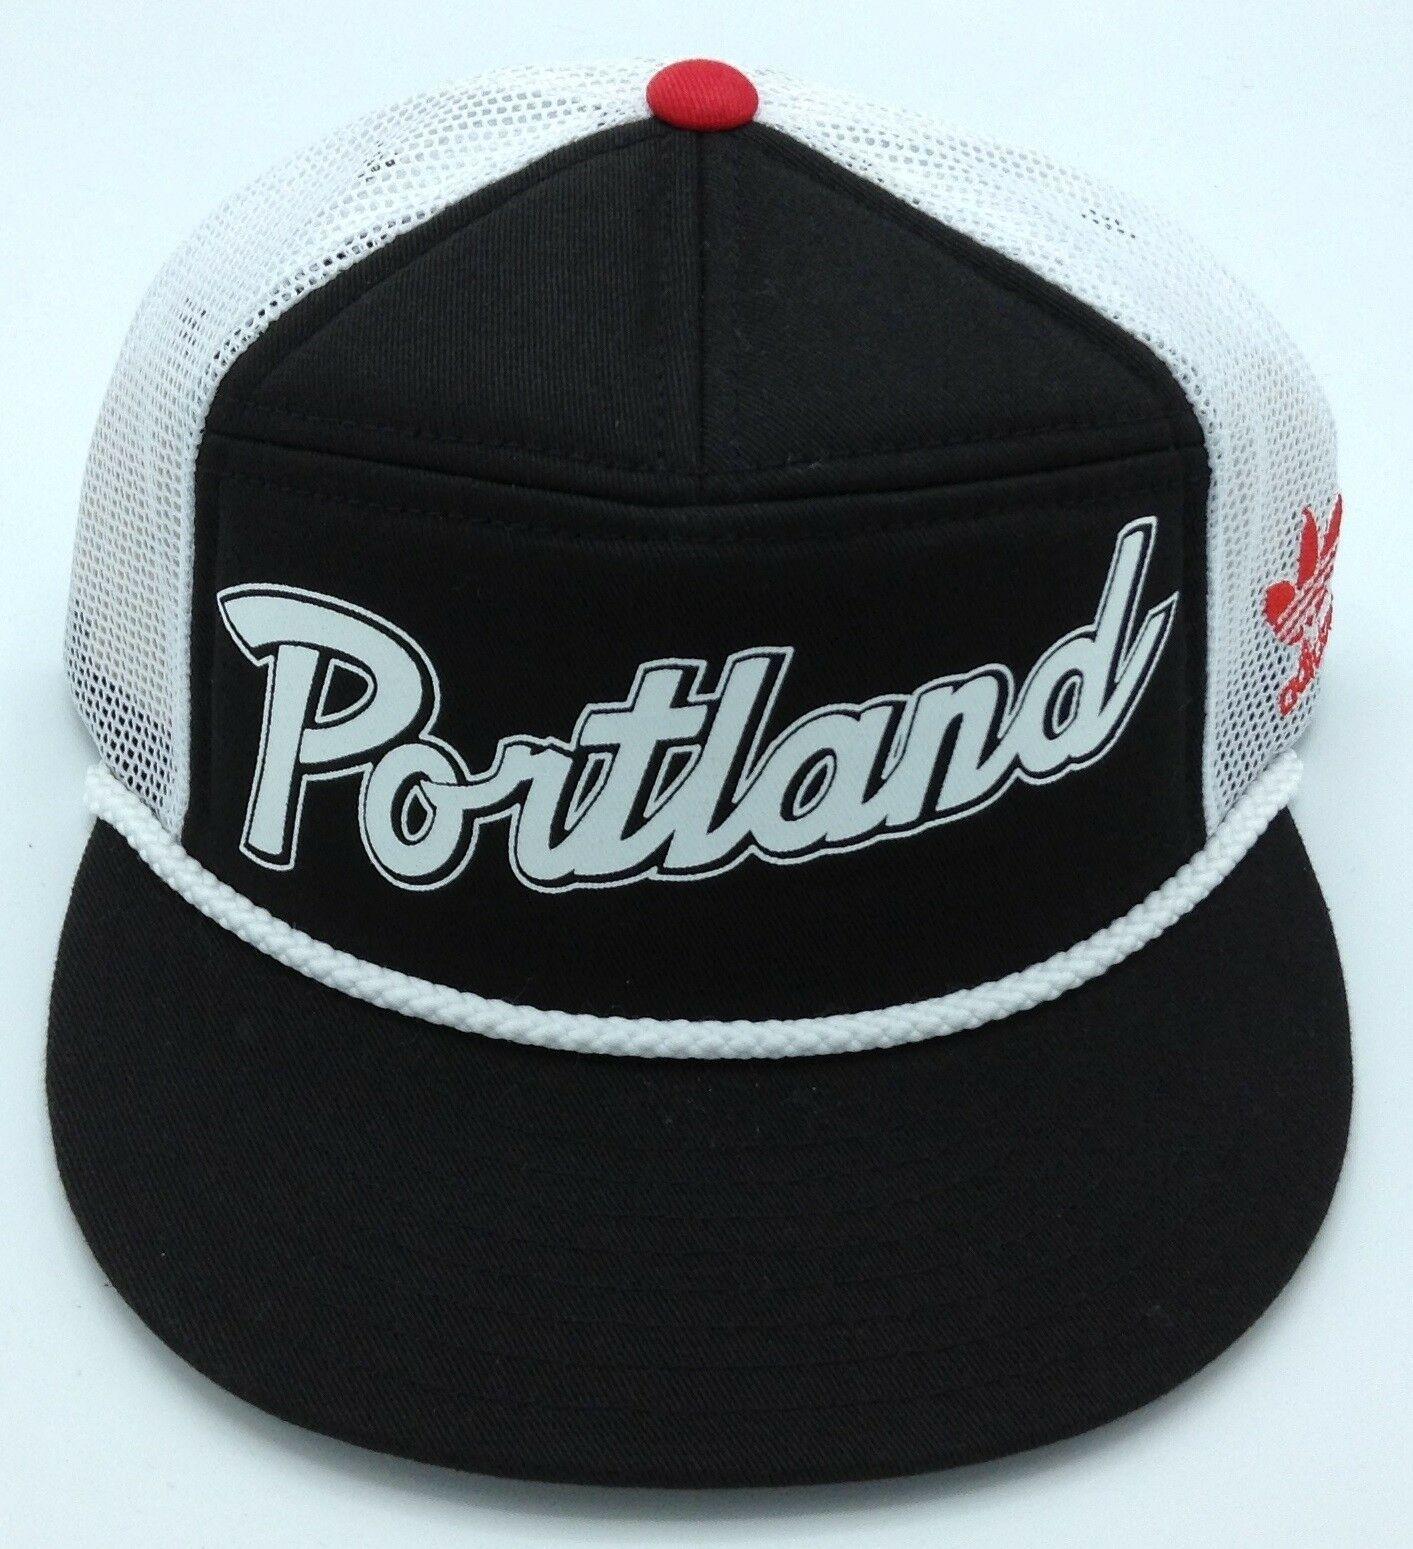 reputable site 127ec 2f247 NBA Portland Trailblazers Adidas Adult Structured Adjustable Fit Cap,  35.99